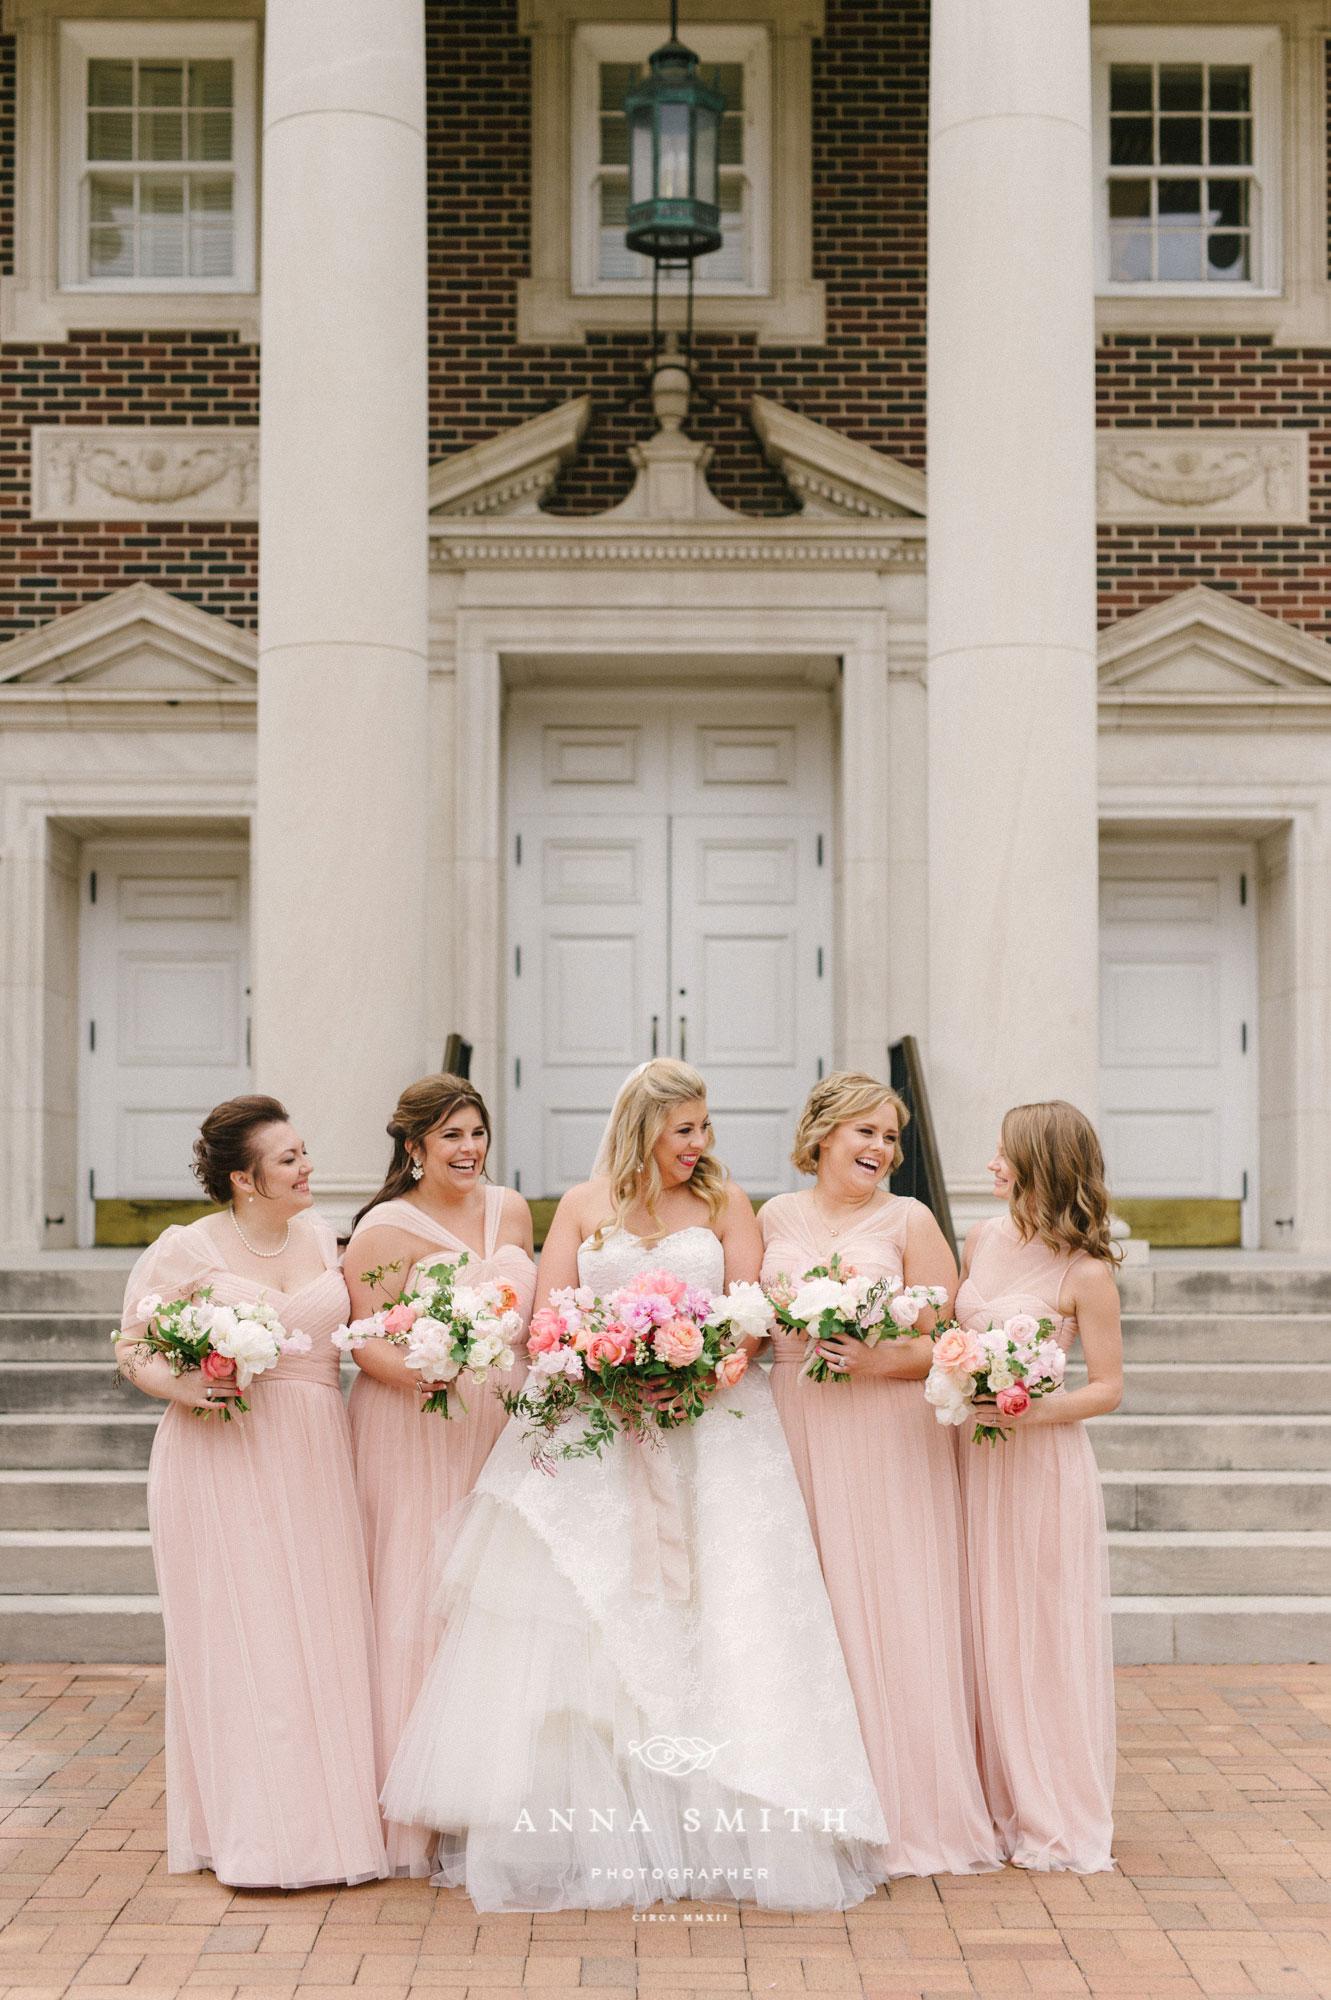 Perkins Chapel wedding with Blush bridesmaid Dresses